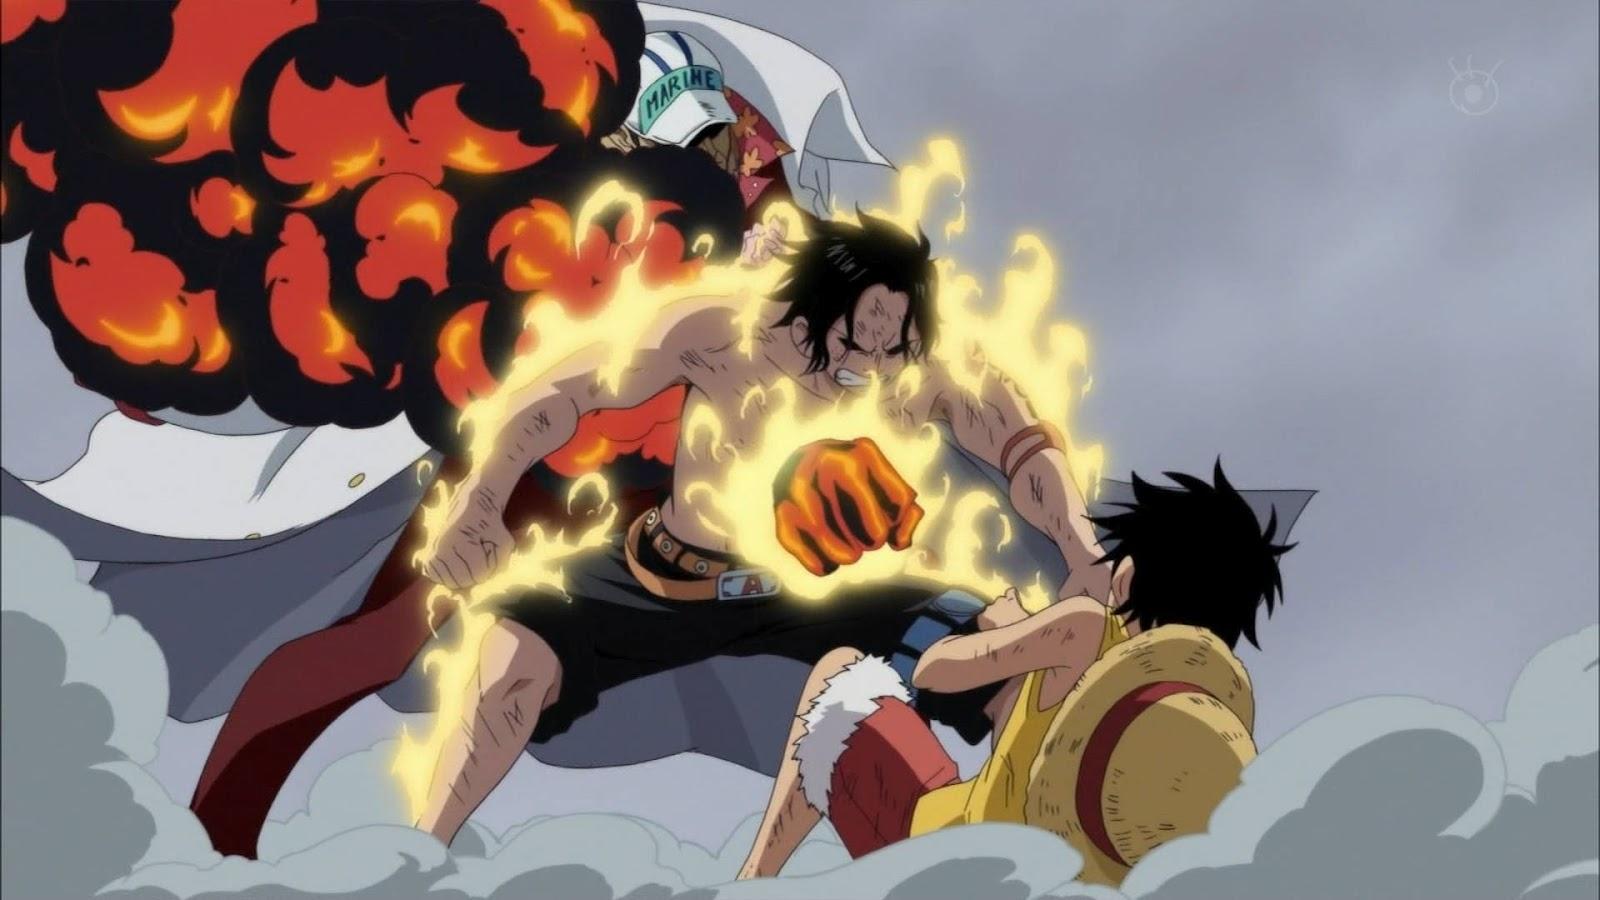 Kata Kata Bijak Di Anime The Law Of Ueki Ace One Piece Morte 1600x900 Wallpaper Teahub Io